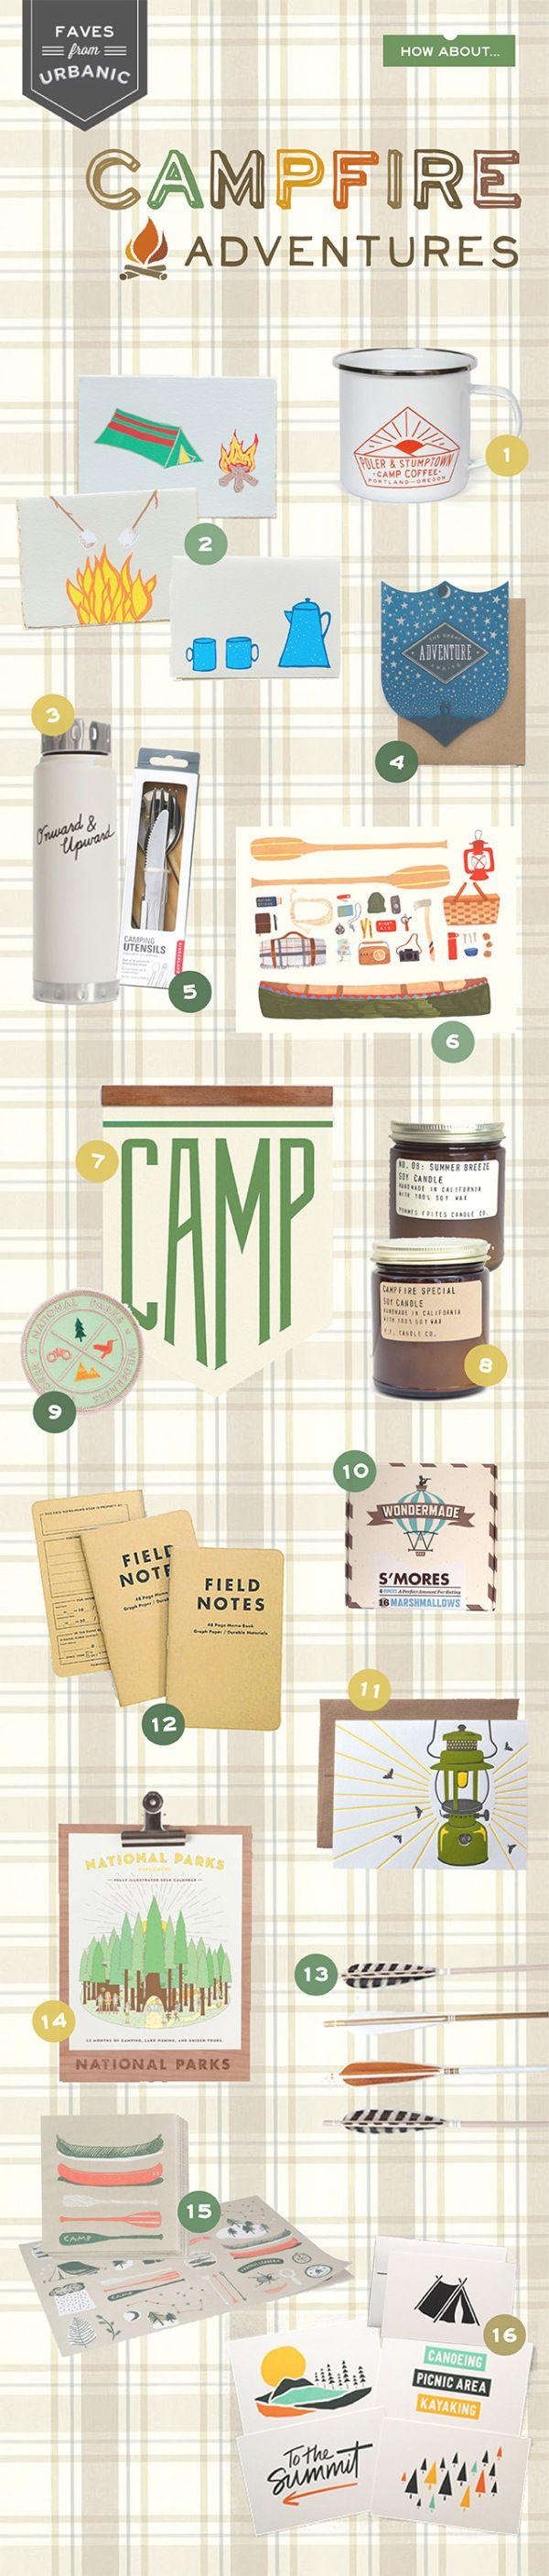 Campfire Adventures Stationery Round Up via Oh So Beautiful Paper: http://ohsobeautifulpaper.com/2014/07/urbanic-faves-campfire-adventures/ | 1. Stumptown Coffee Roasters; 2. Gold Teeth Brooklyn; 3. I